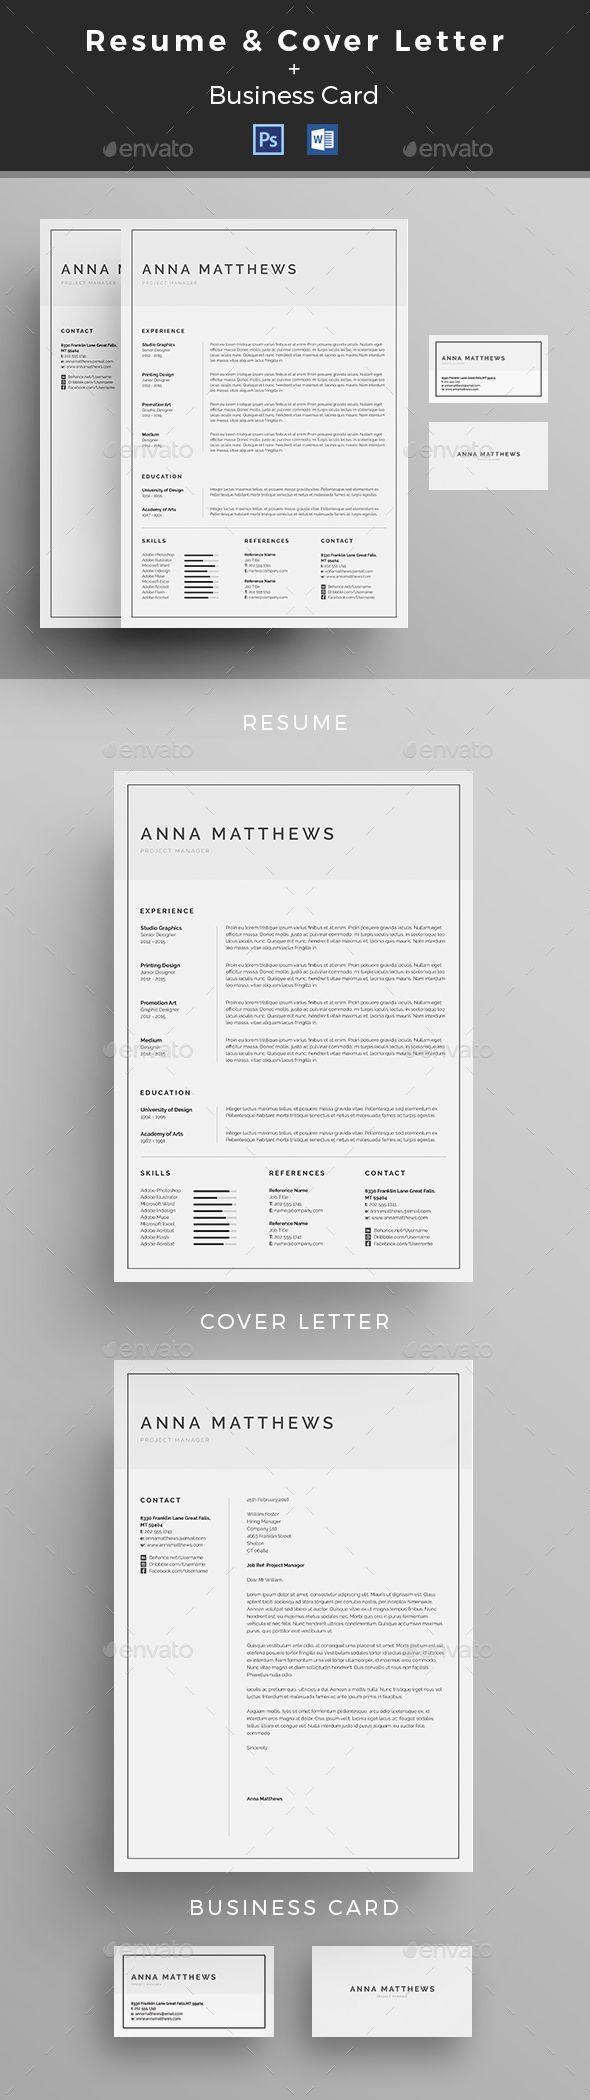 Minimal Resume | CV  — PSD Template #creative #cover letter • Download ➝ https://graphicriver.net/item/minimal-resume-cv/18118283?ref=pxcr